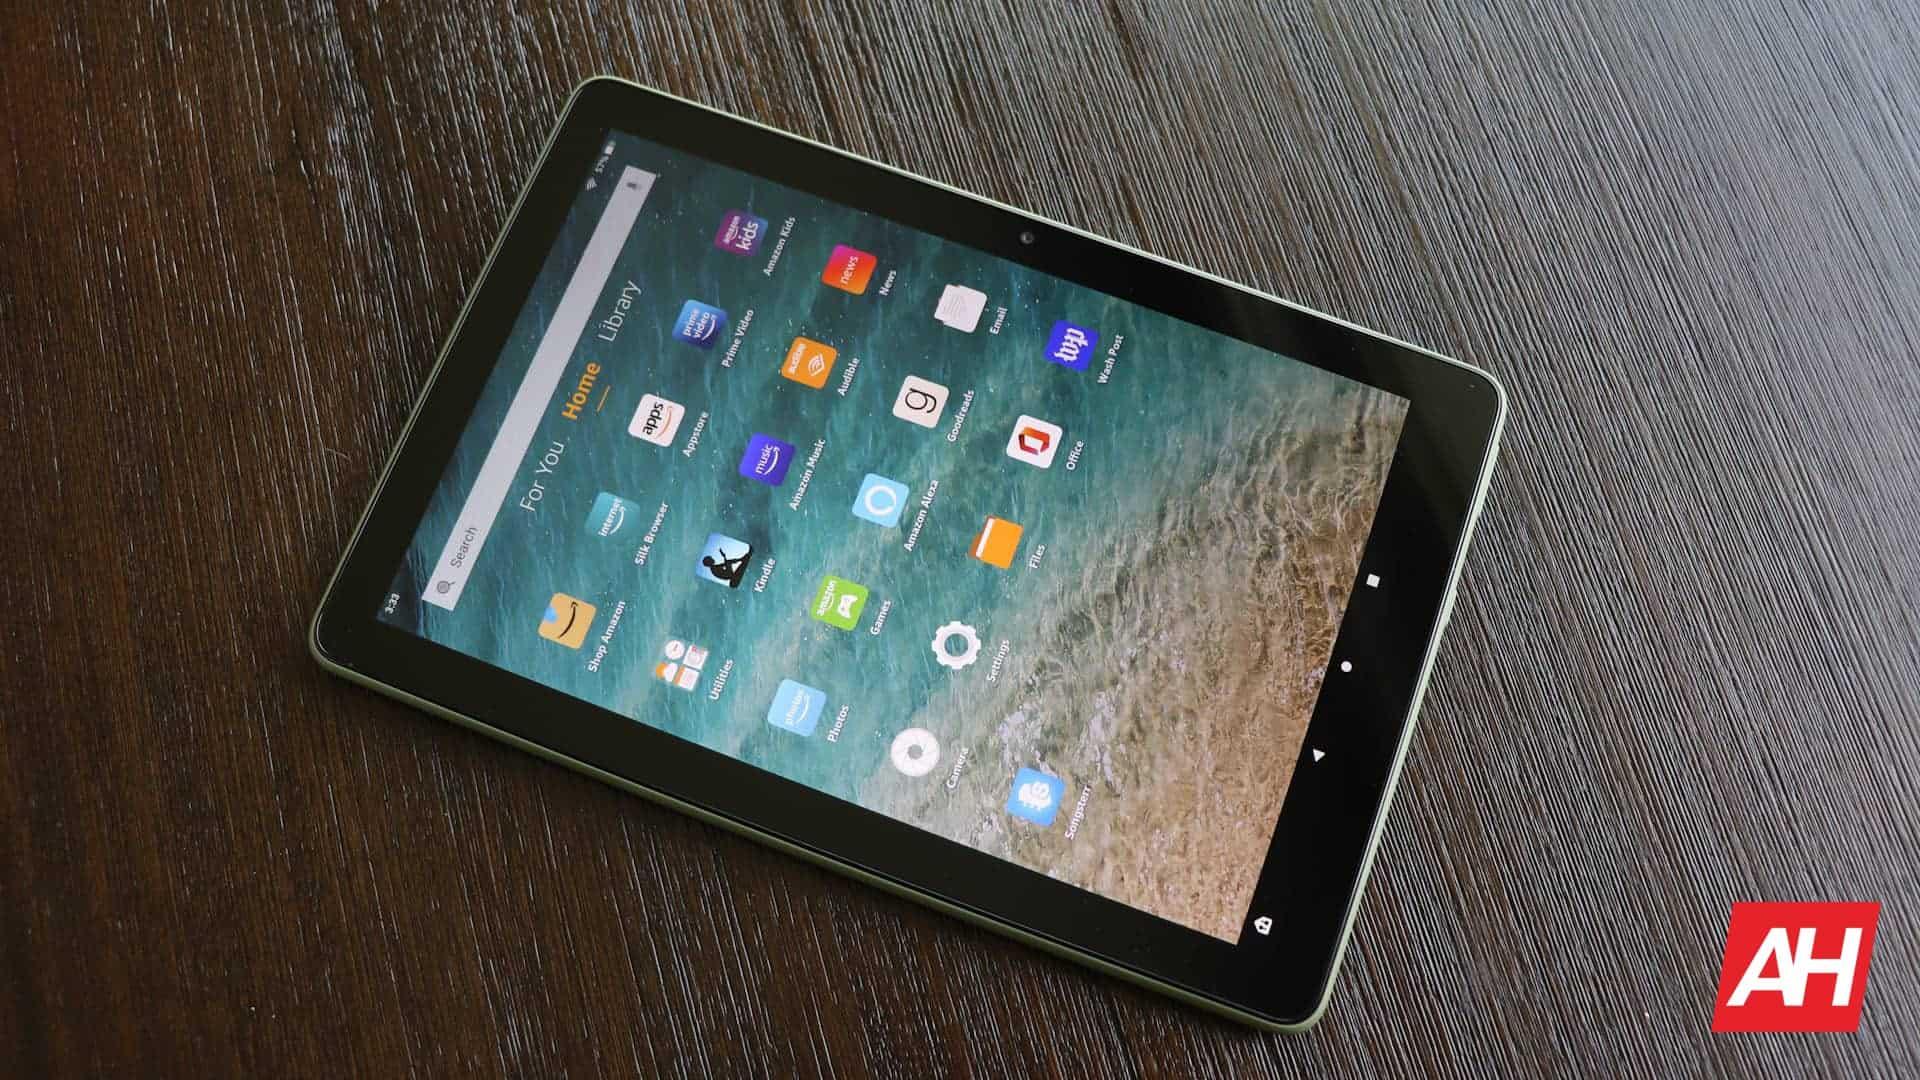 06 Amazon Fire HD 10 review software DG AH 2021